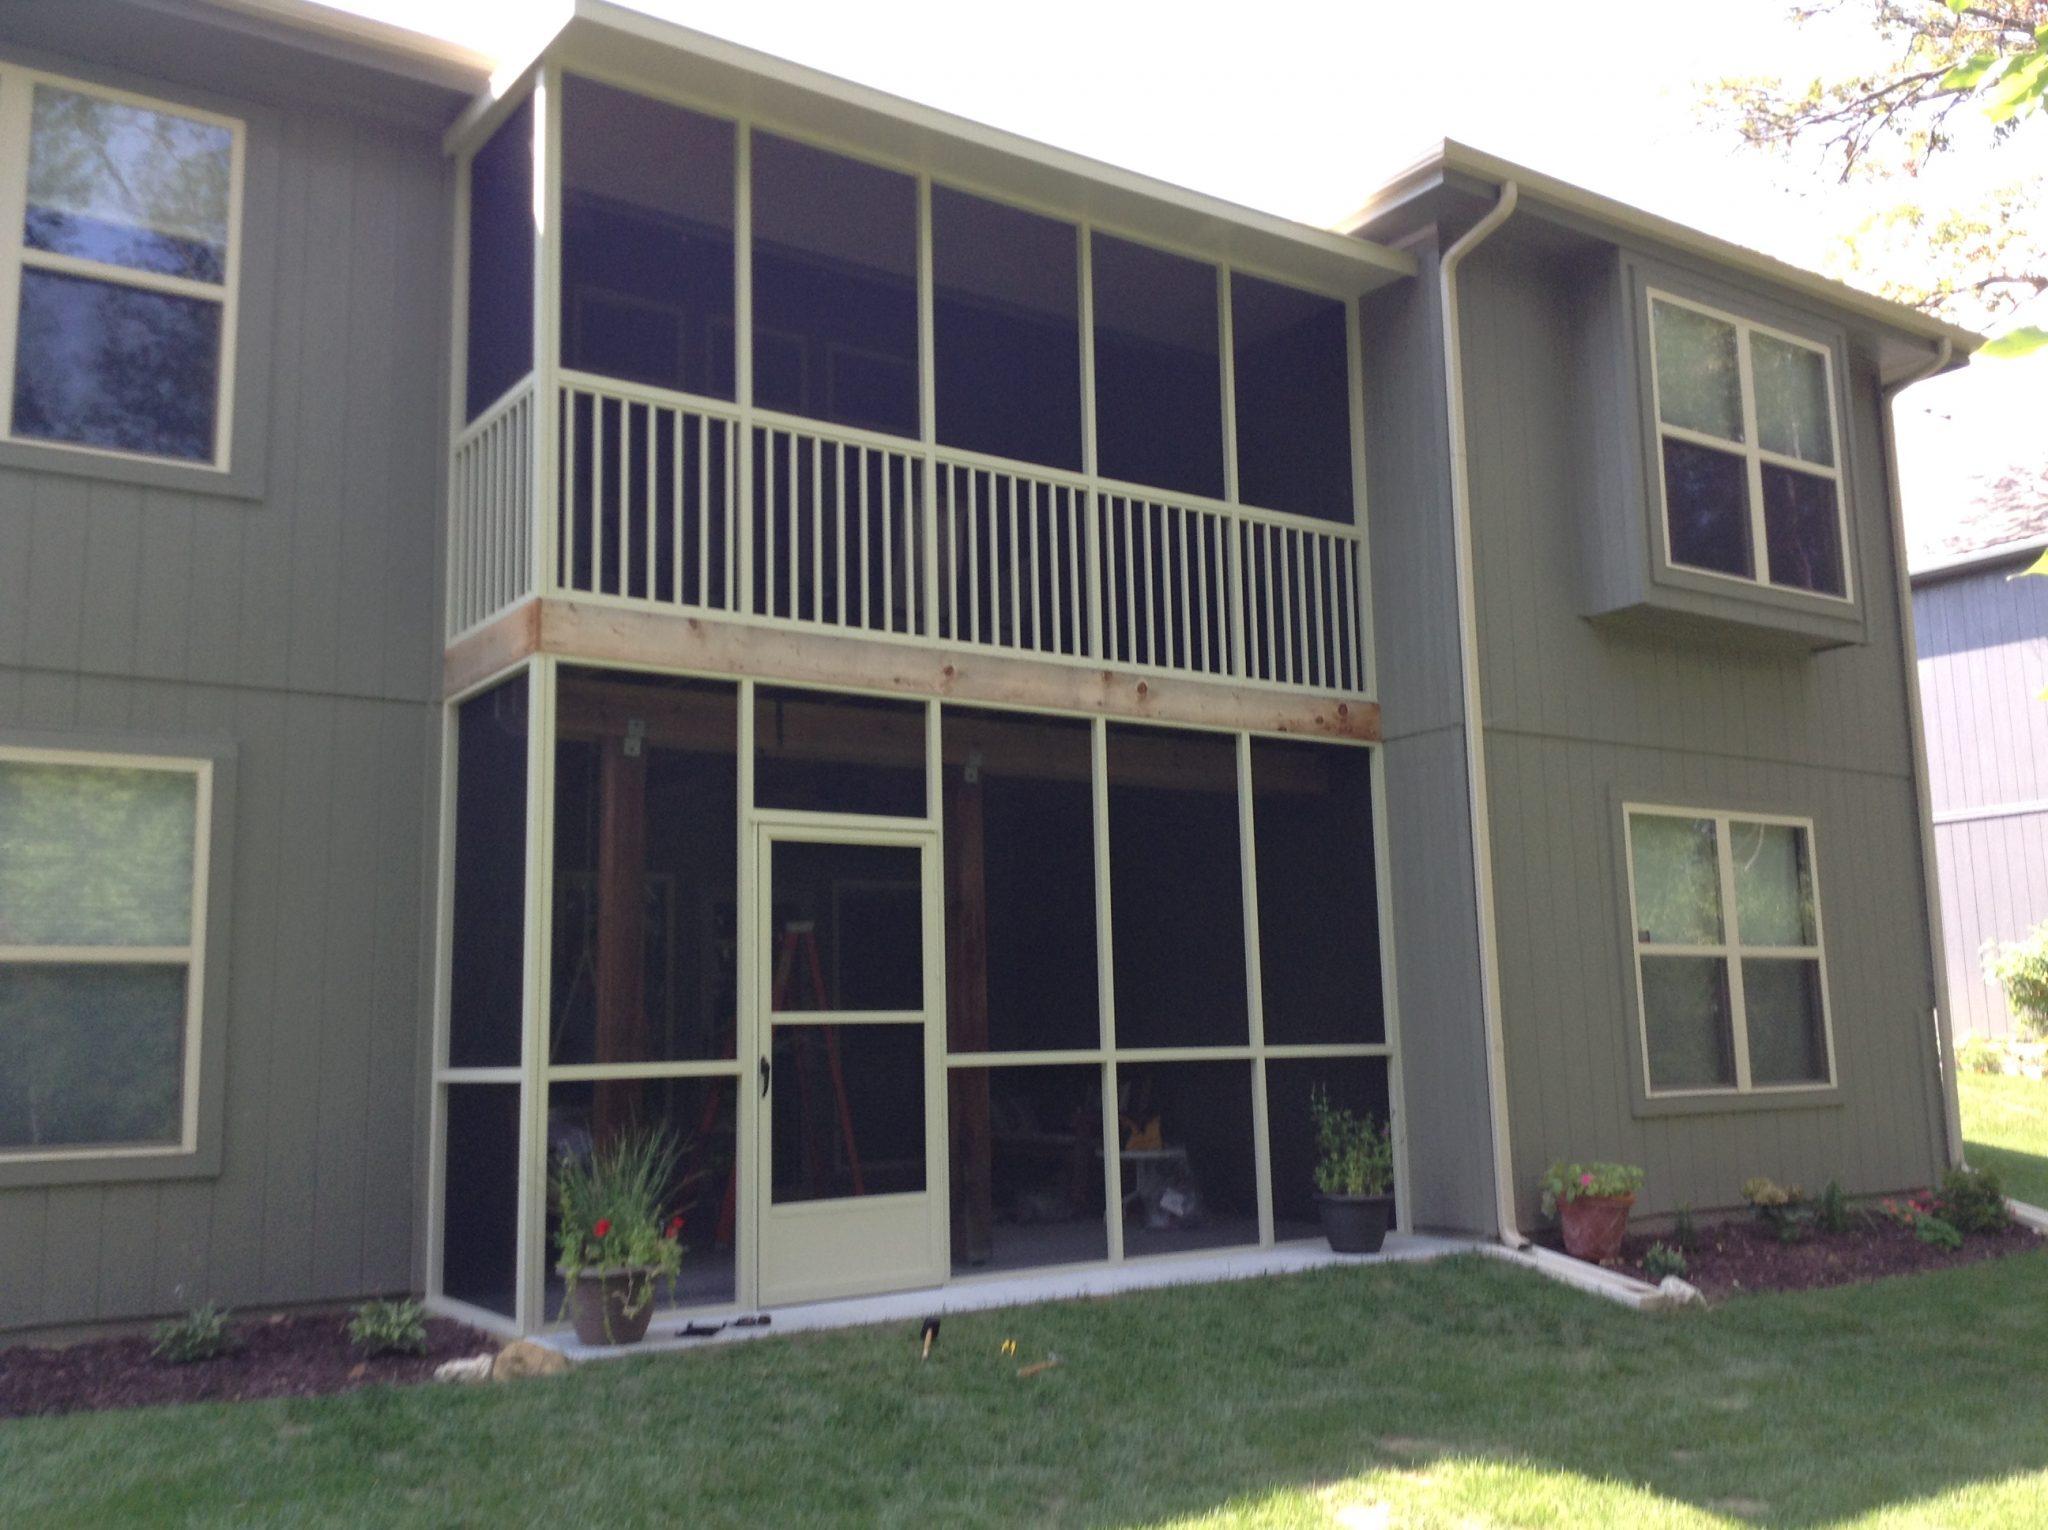 Home Page - Glenlo Awning & Window Company